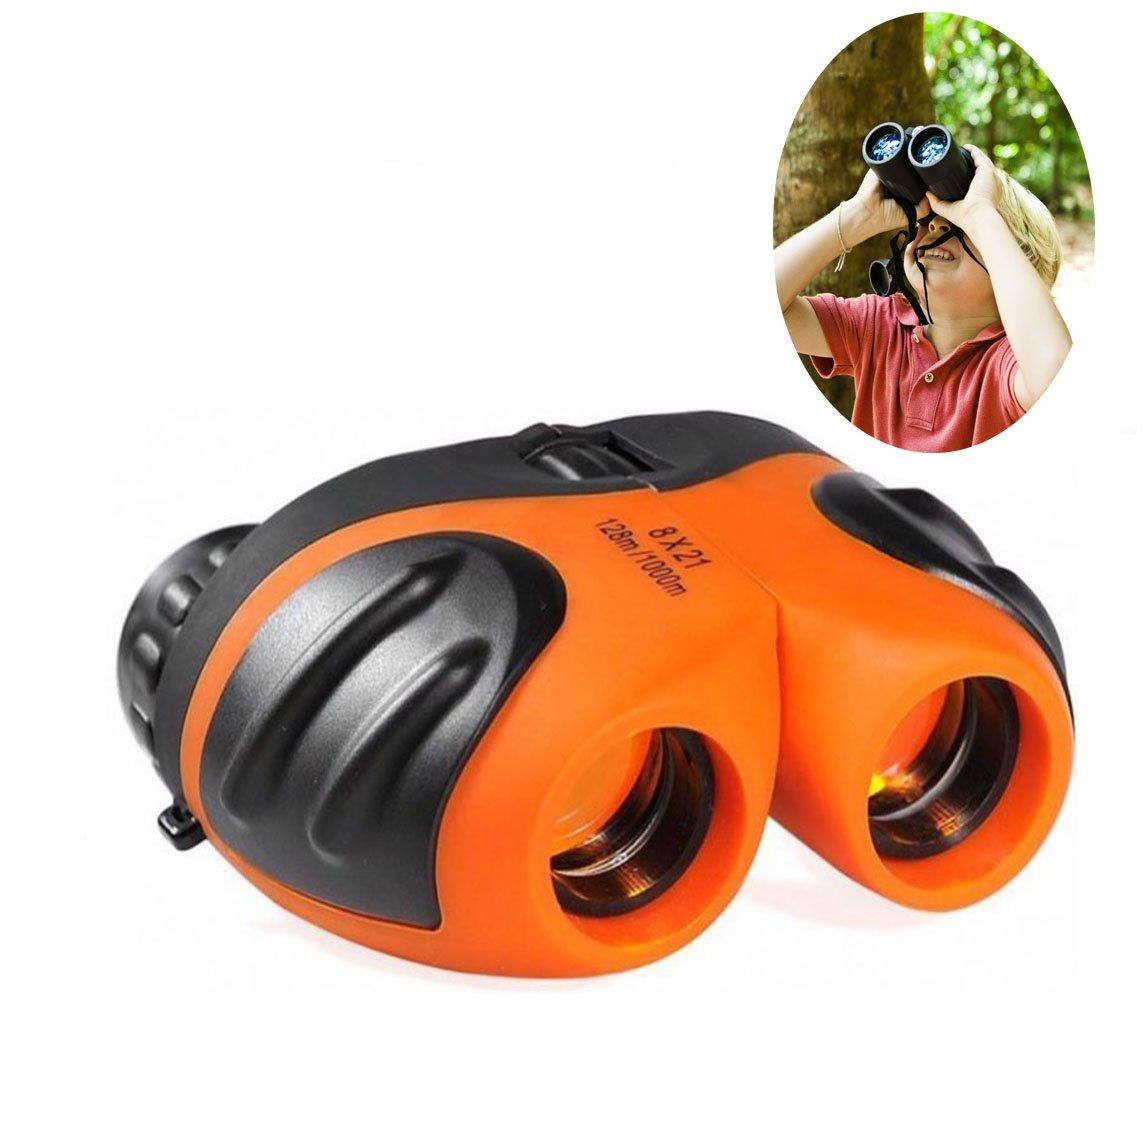 JRD & BS WINLコンパクトWatreproof & Shock Proof双眼for Kids – Best Gifts B07F38R2VP Orange 01 Orange 01